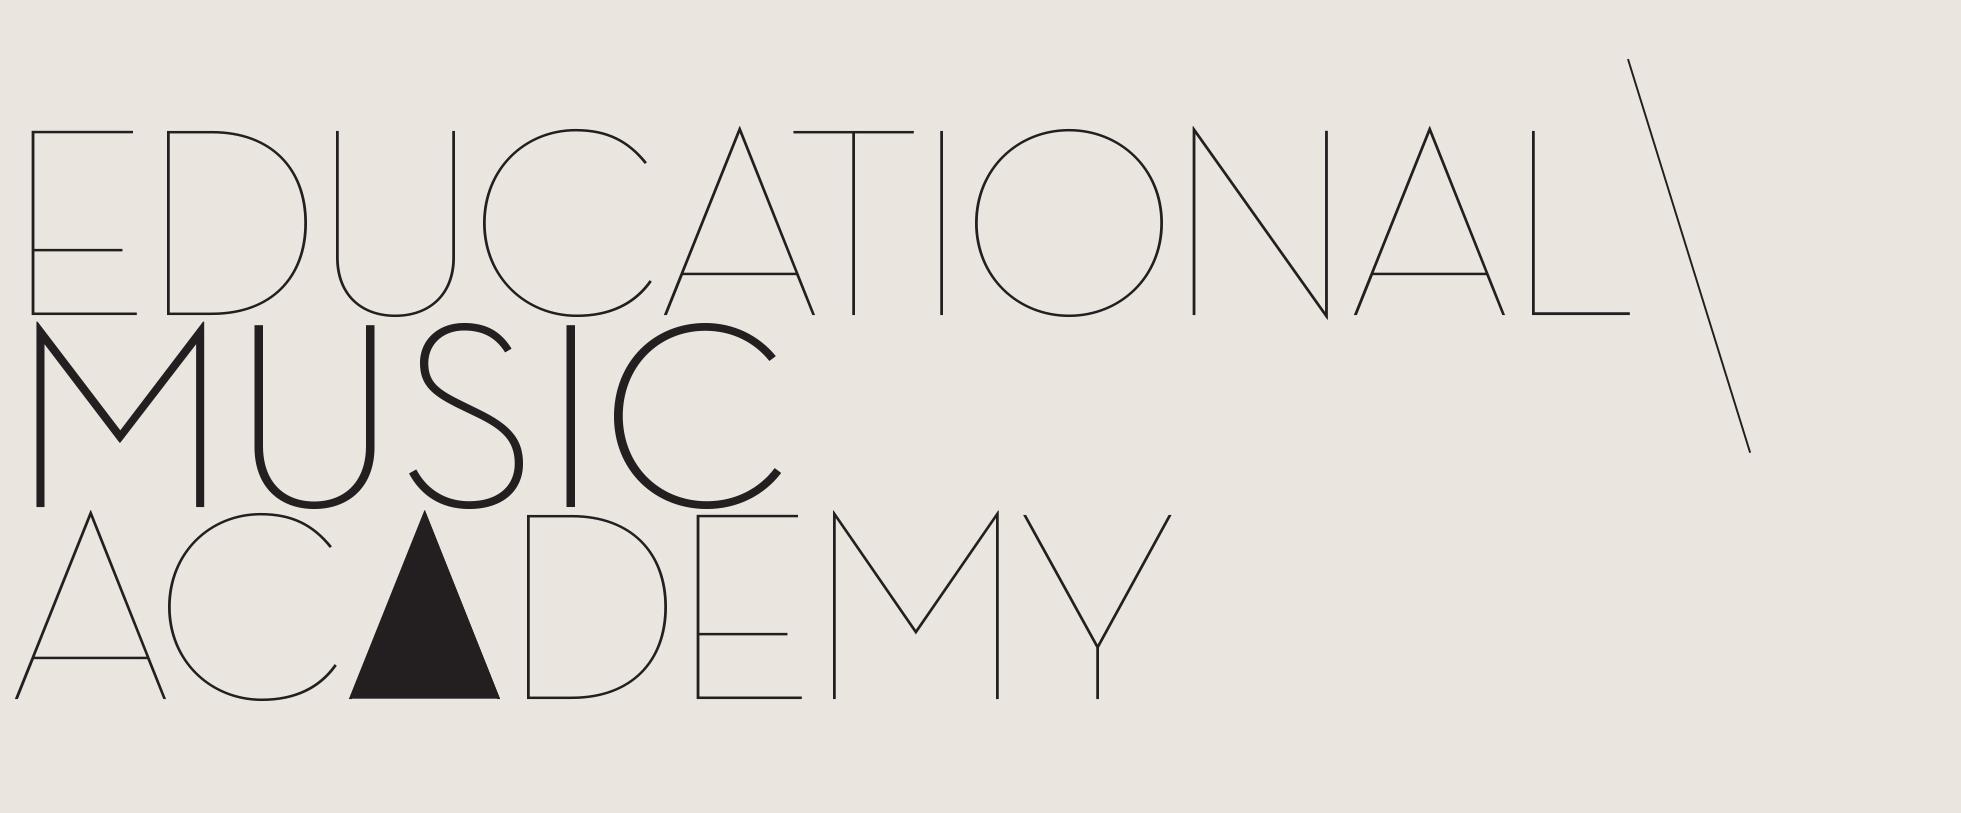 educational music academy logo